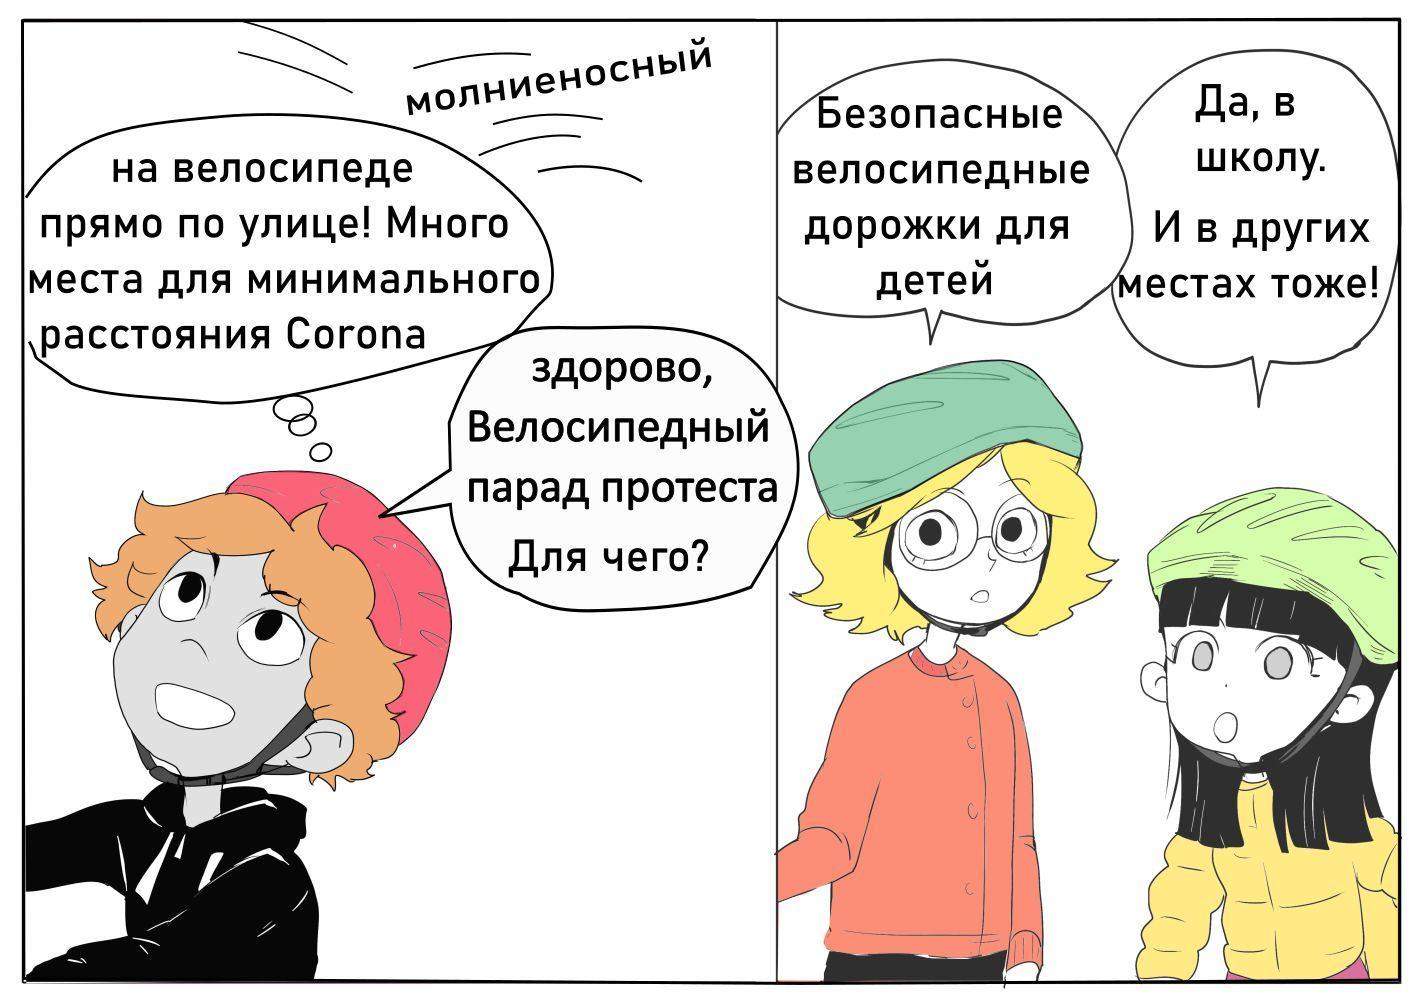 RU_04_wow_demo_1000_RUS